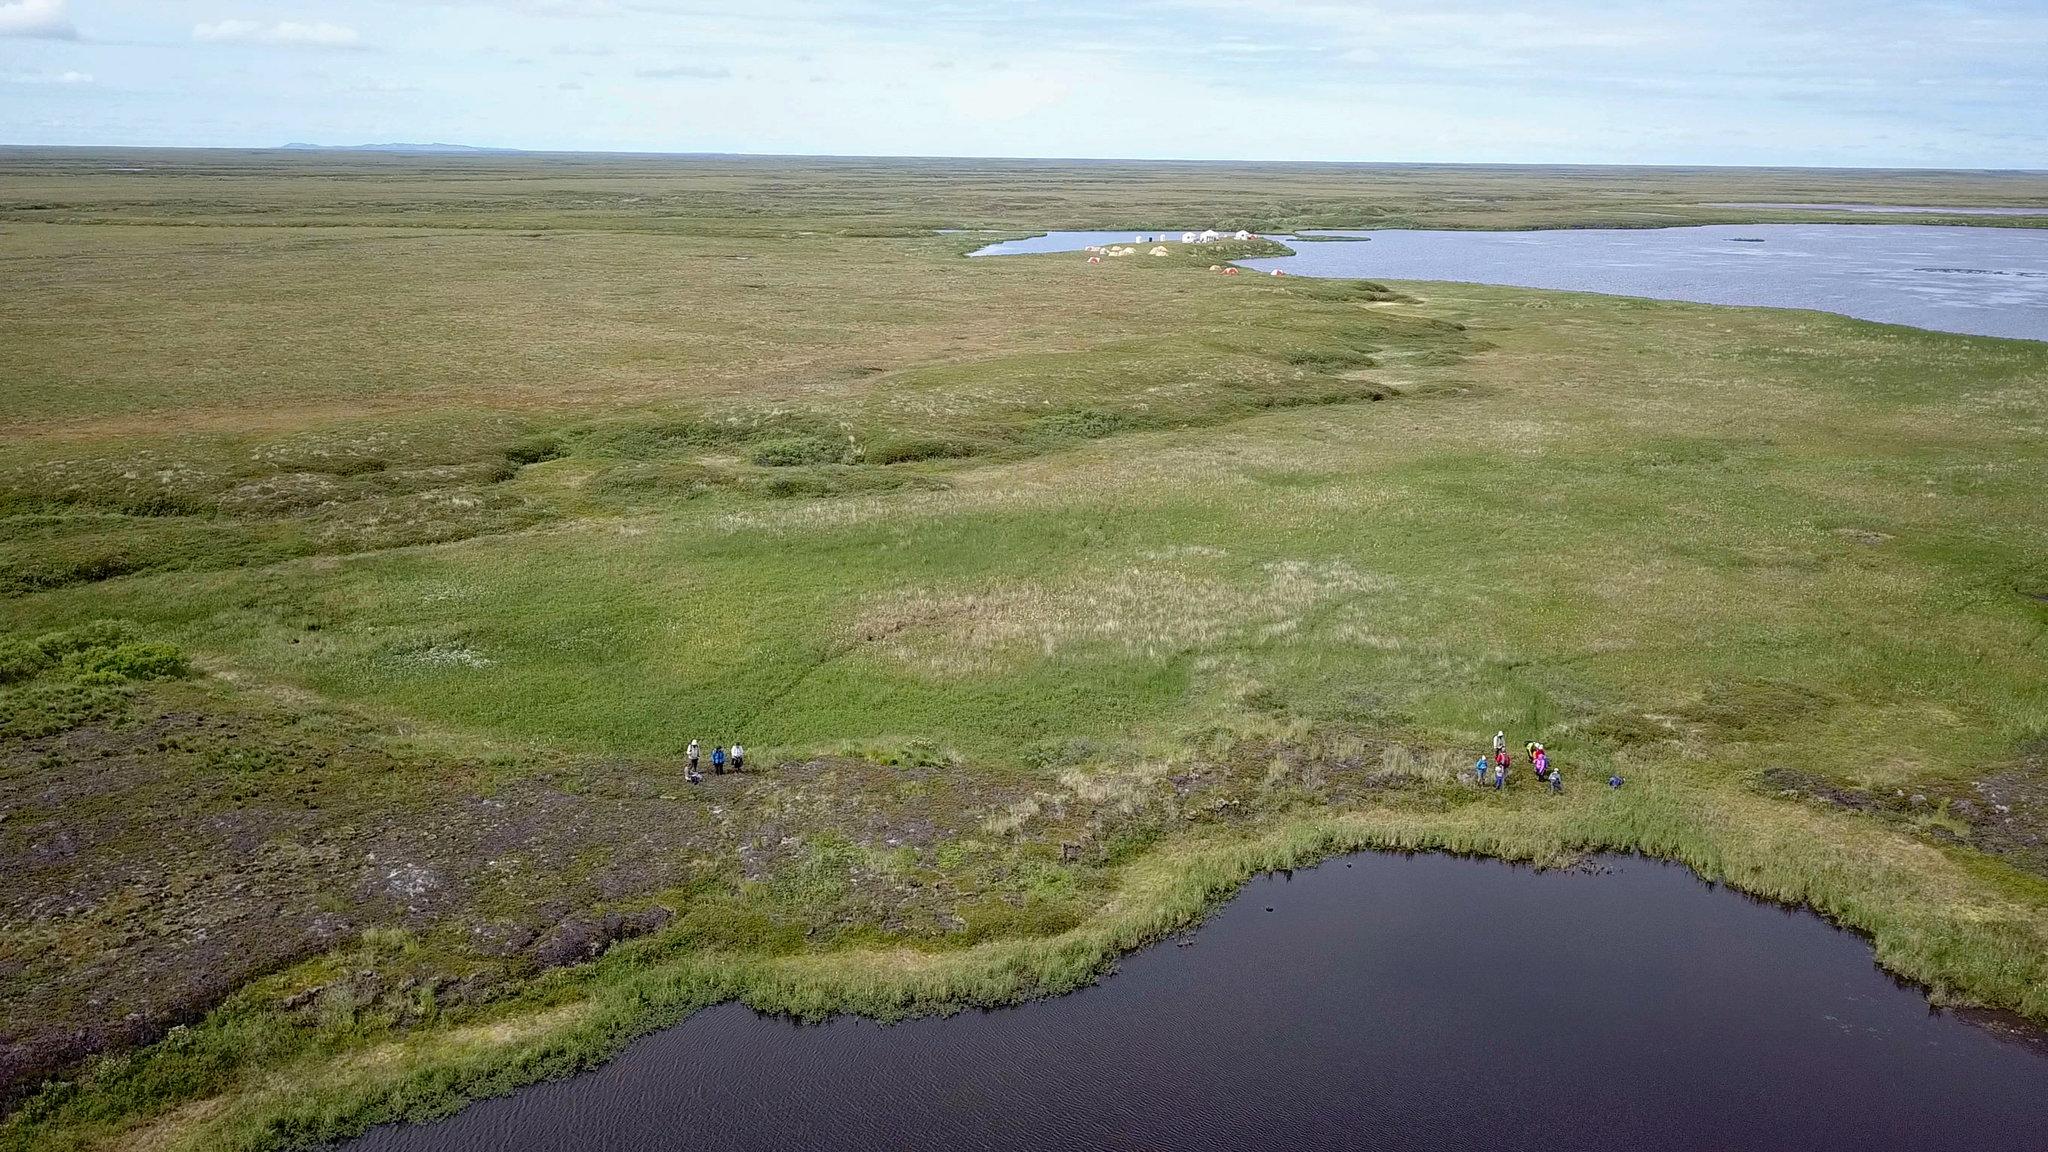 Alaska's permafrost is thawing